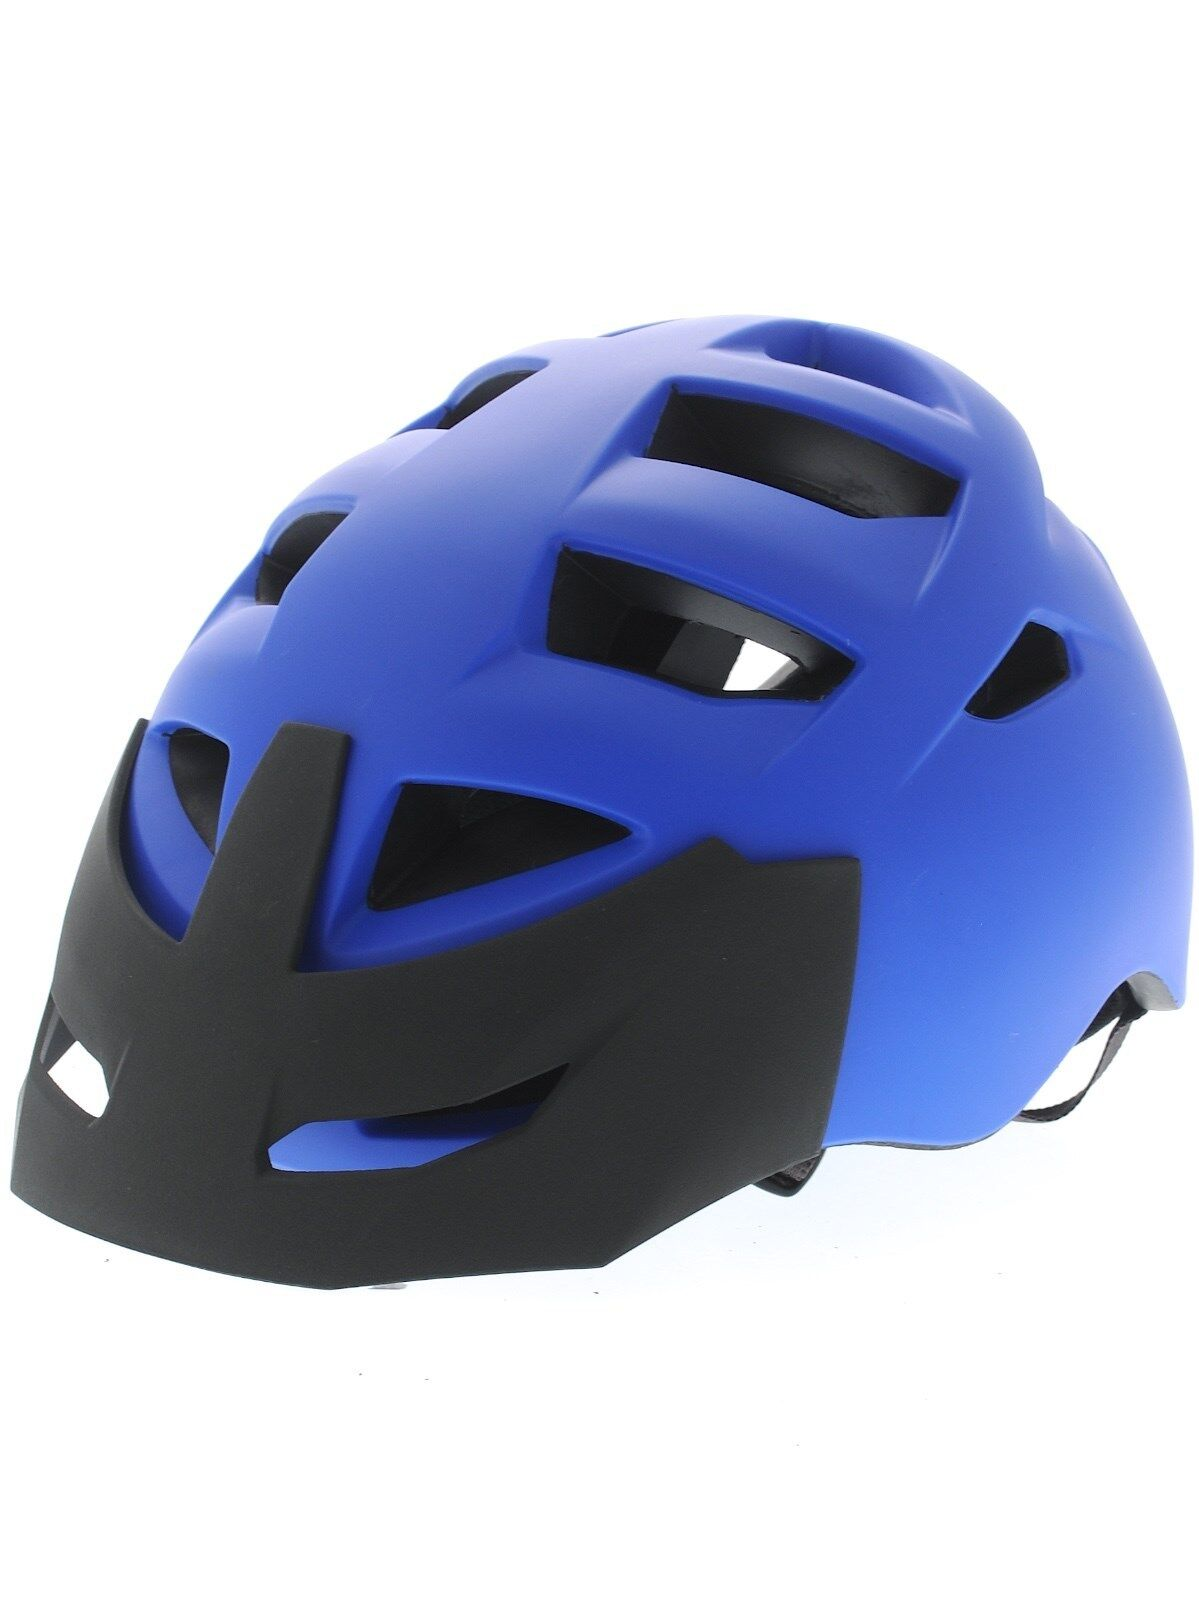 Bern Morrison Zipmold Bicicletta Casco da Bicicletta,Race Blu SM LXL XXLXXXL